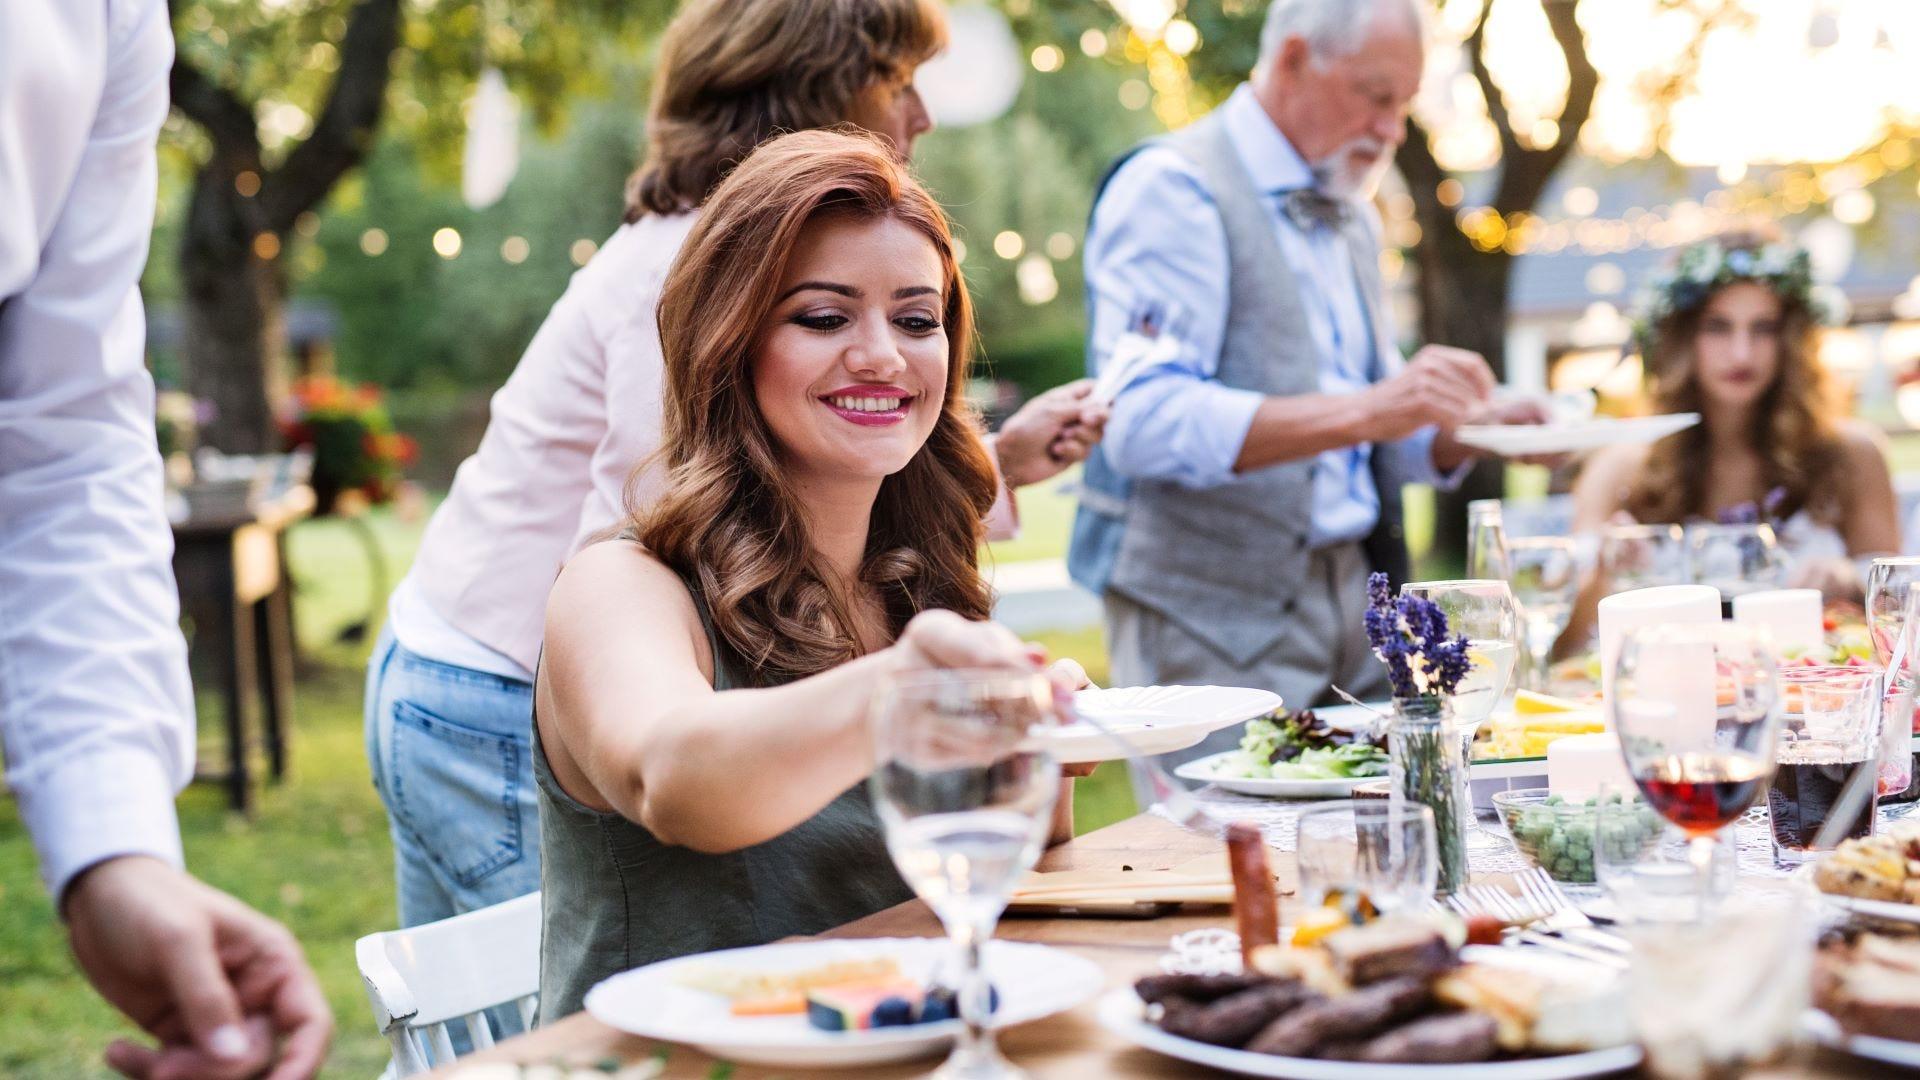 People enjoying an outdoor wedding dinner.